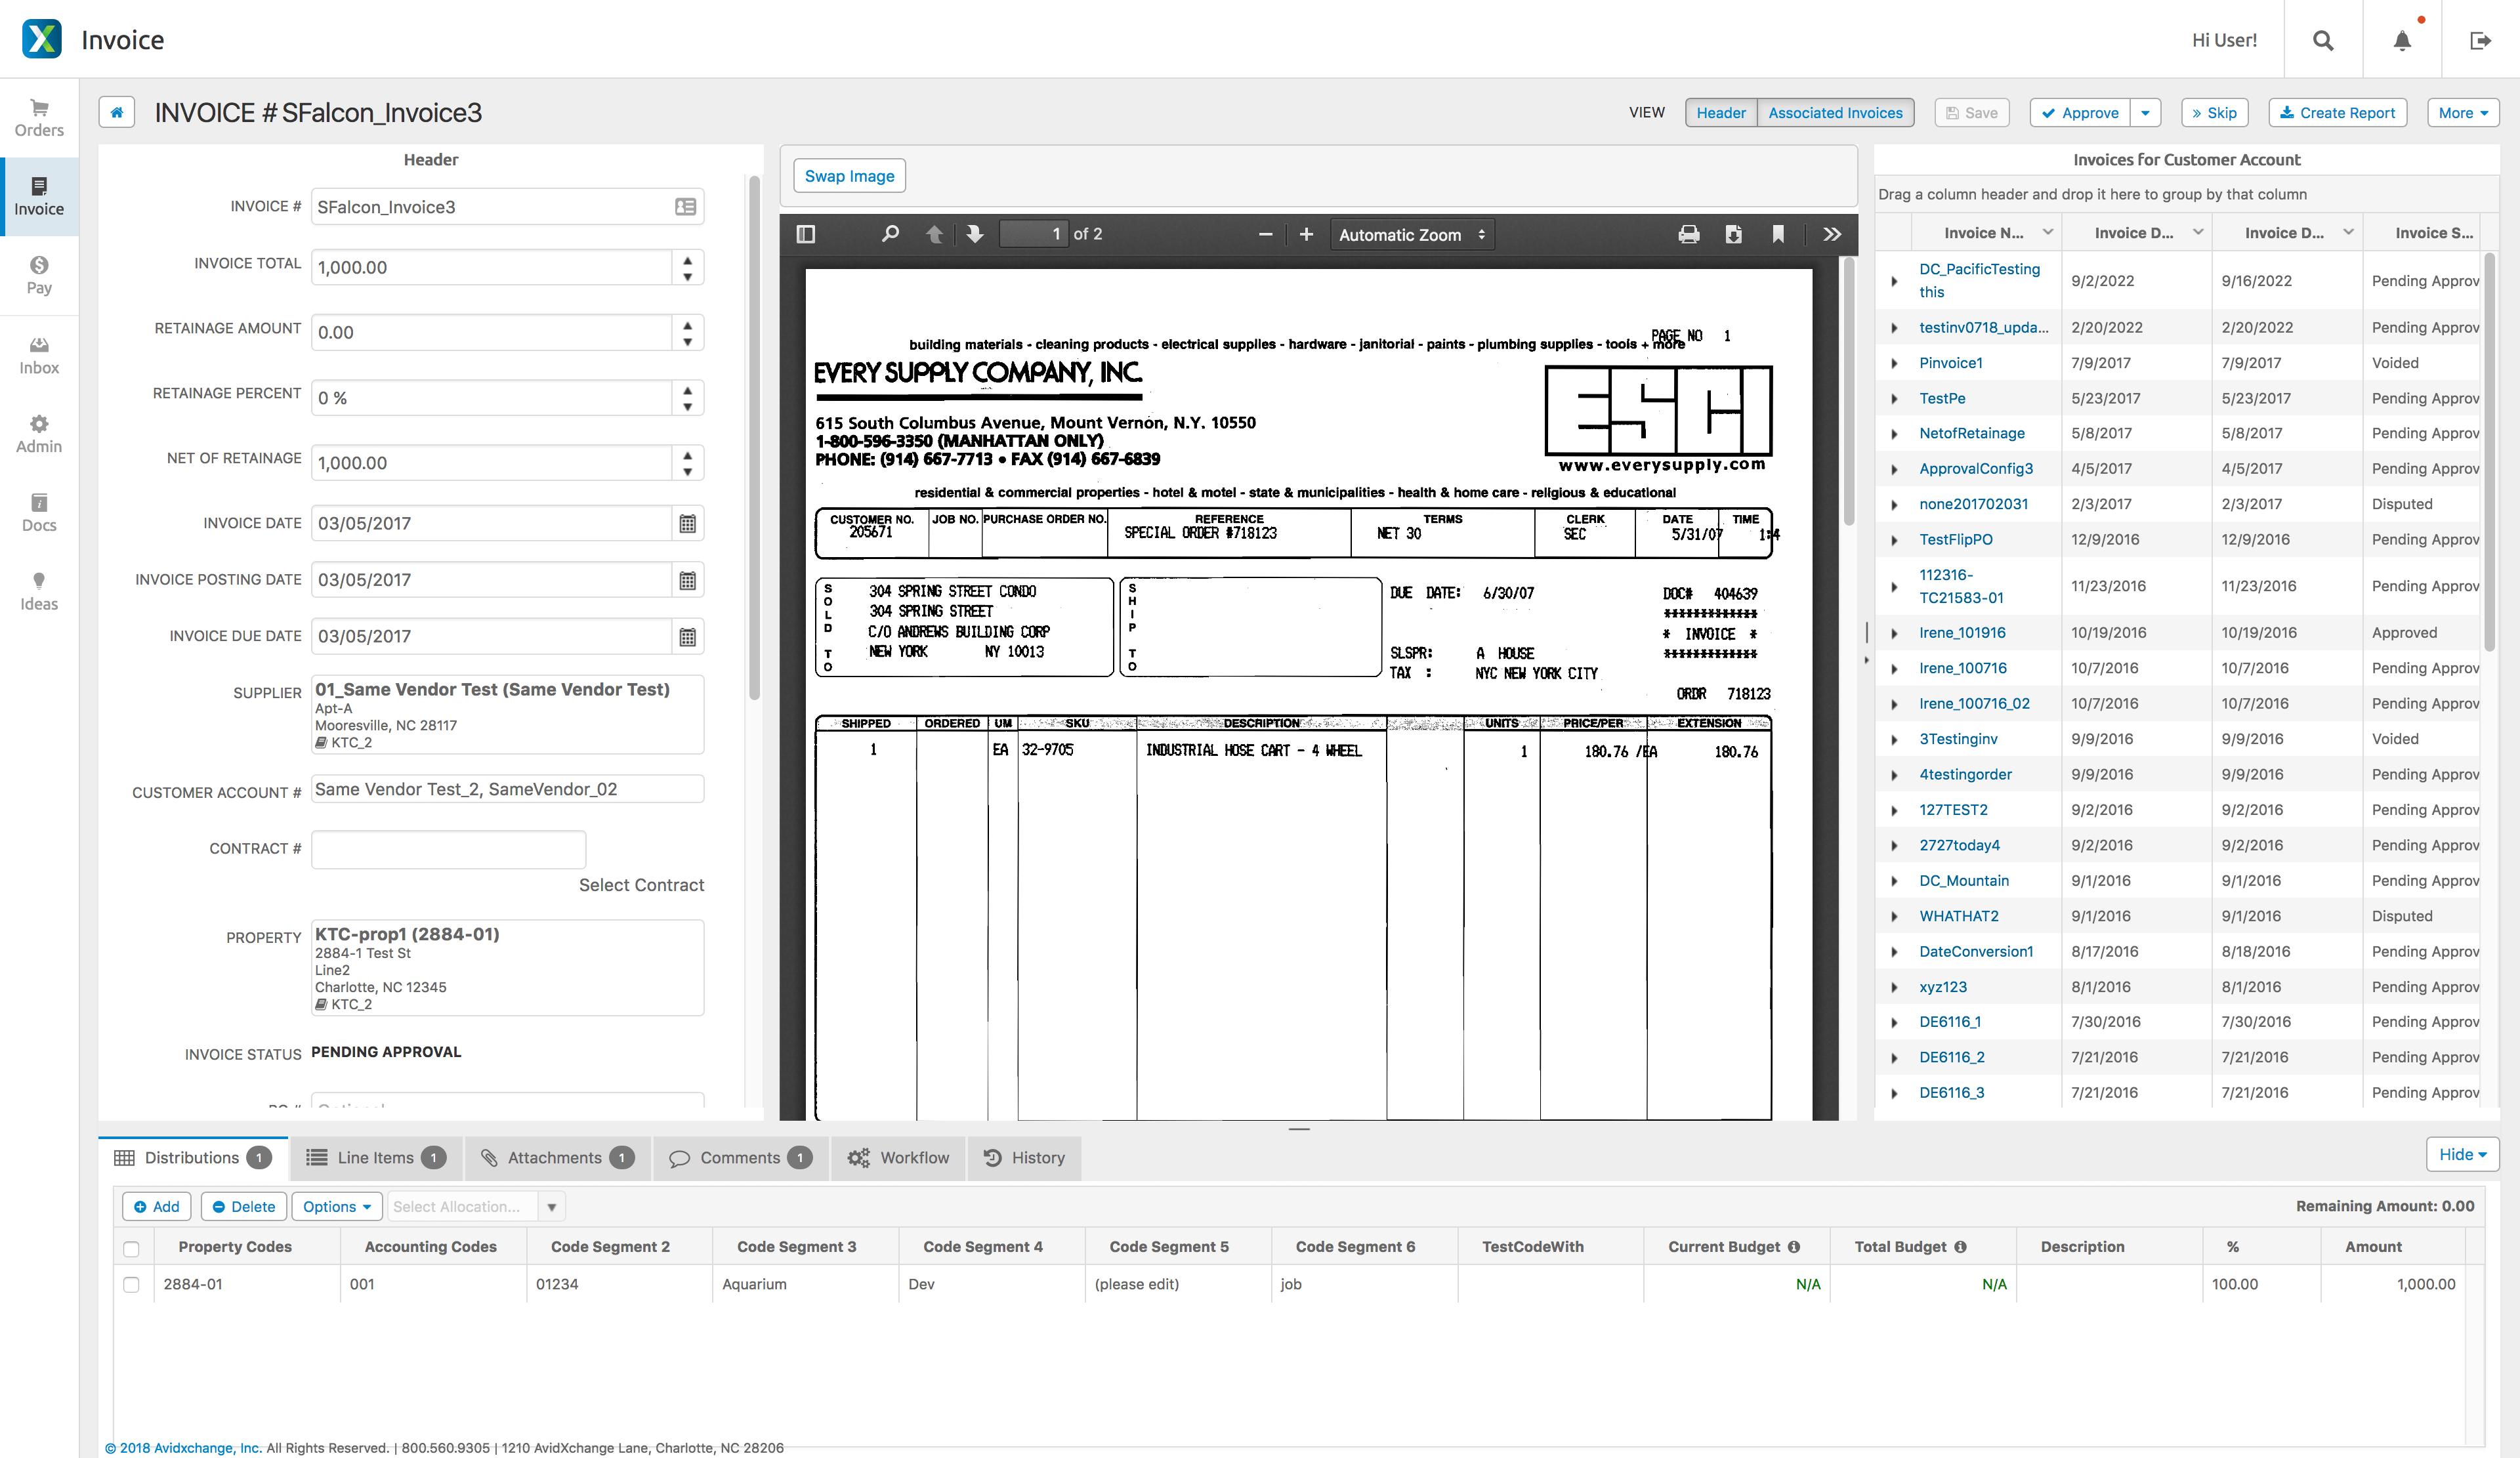 AvidXchange Software - AvidXchange invoice detail & associated invoices screenshot